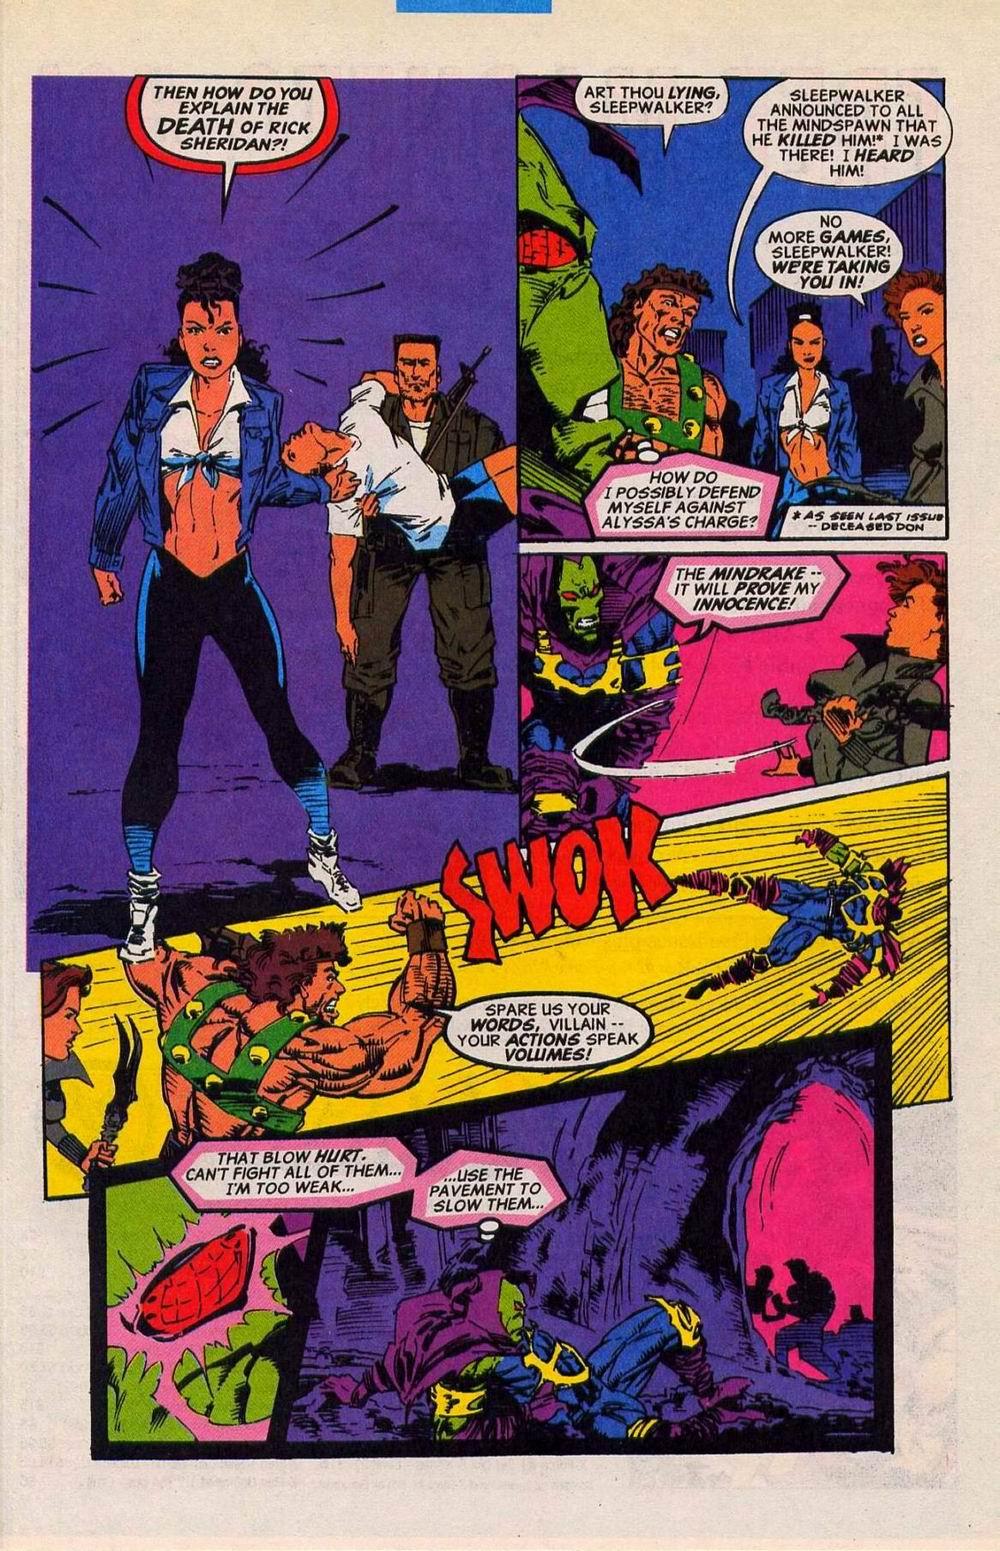 Read online Sleepwalker comic -  Issue #27 - 20